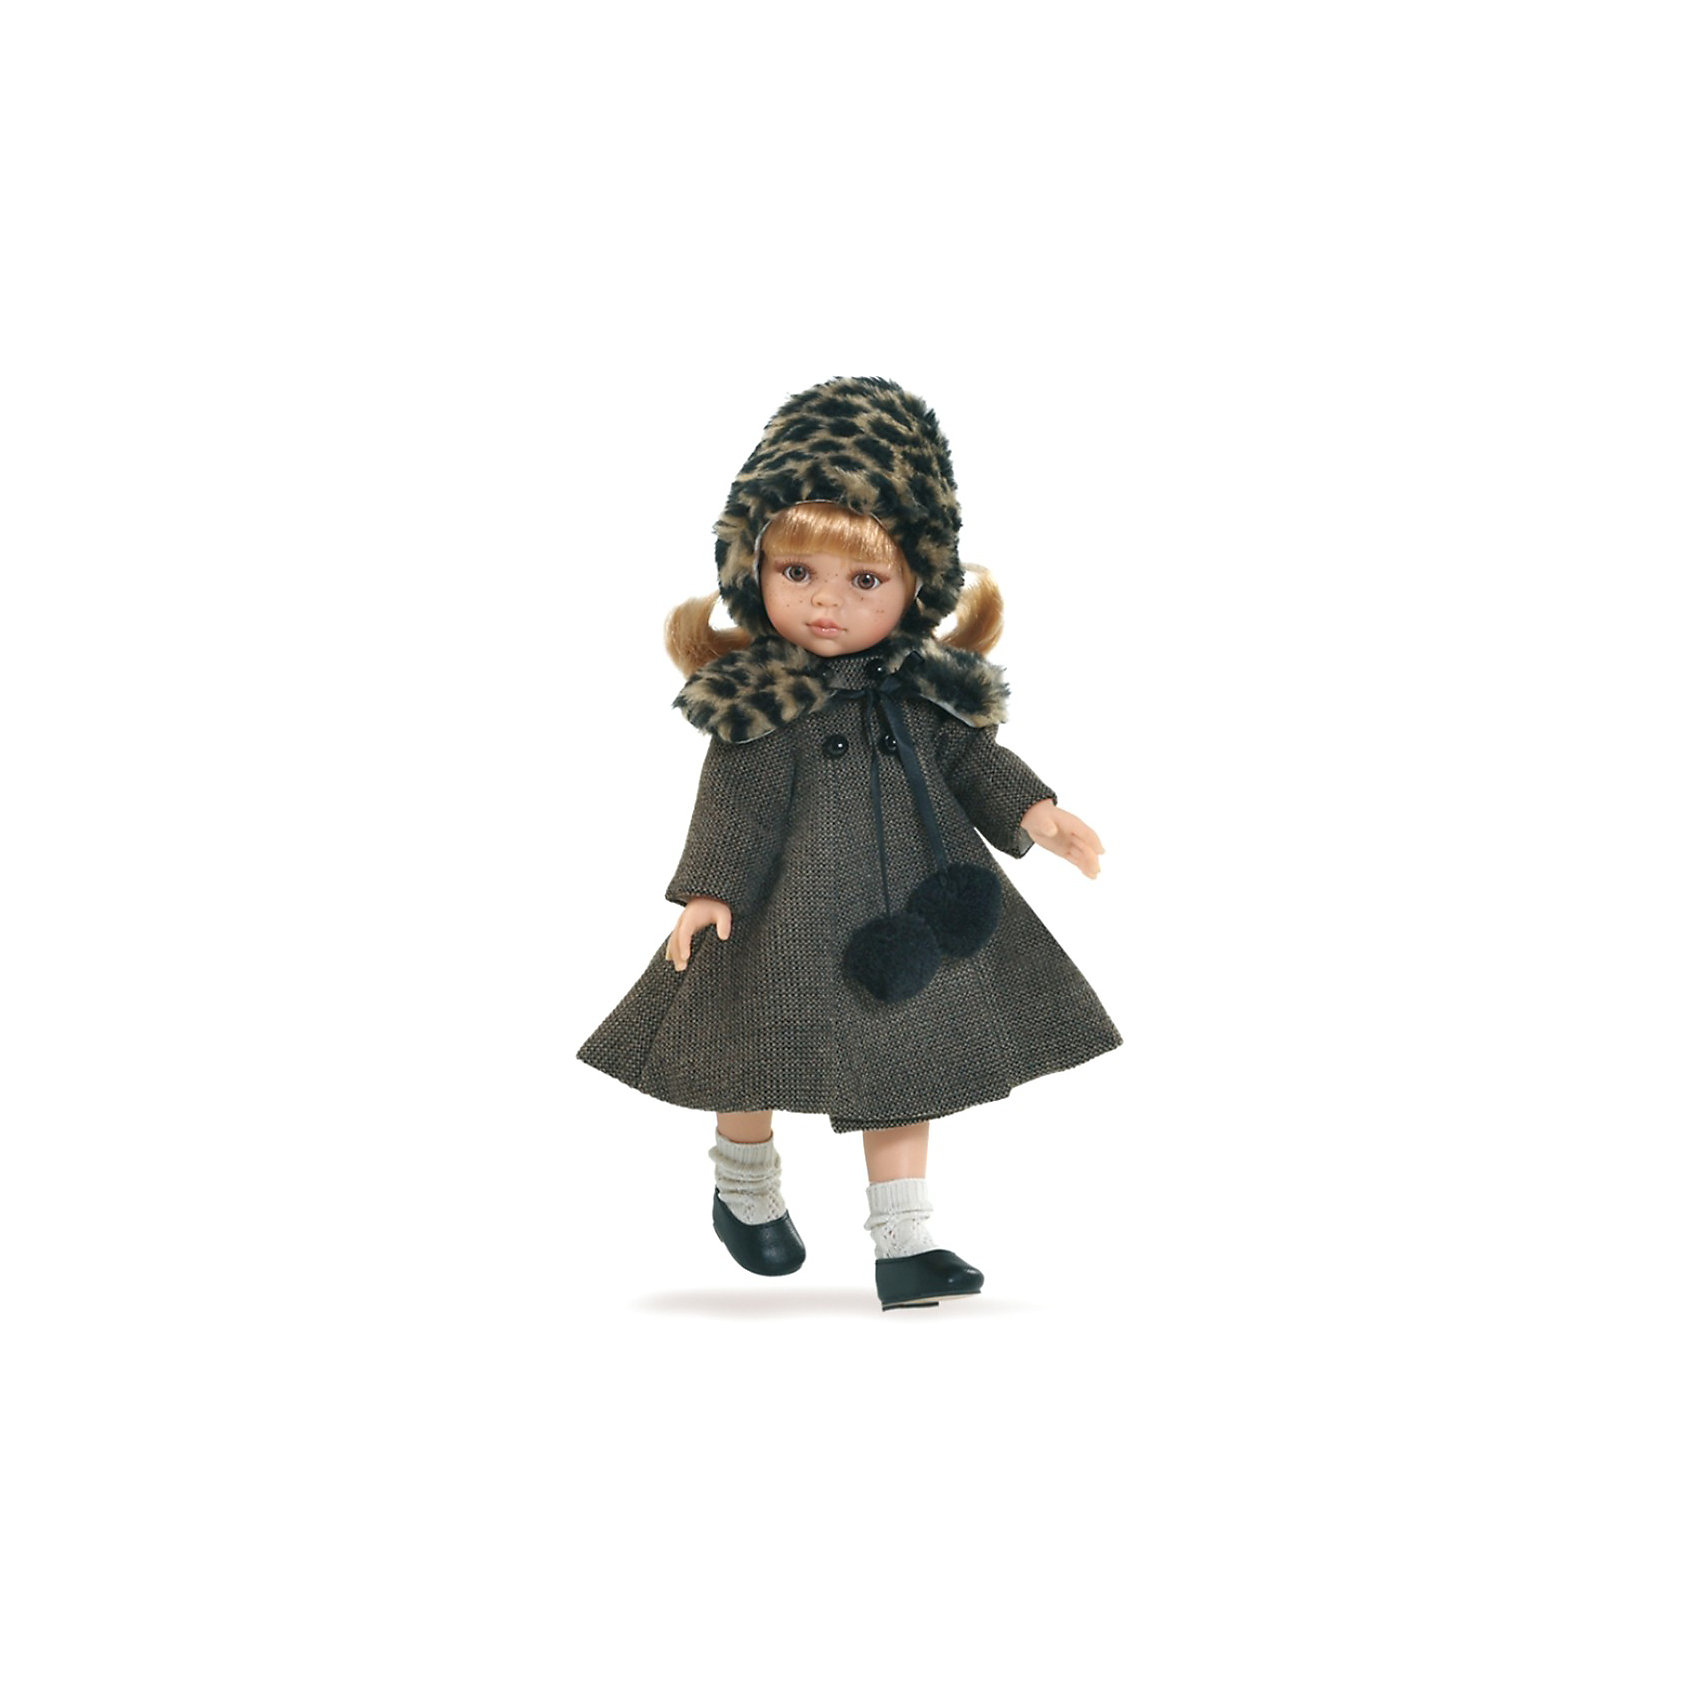 Paola Reina Кукла Даша, 32см, Paola Reina кукла маленькая леди даша в платье 1979746